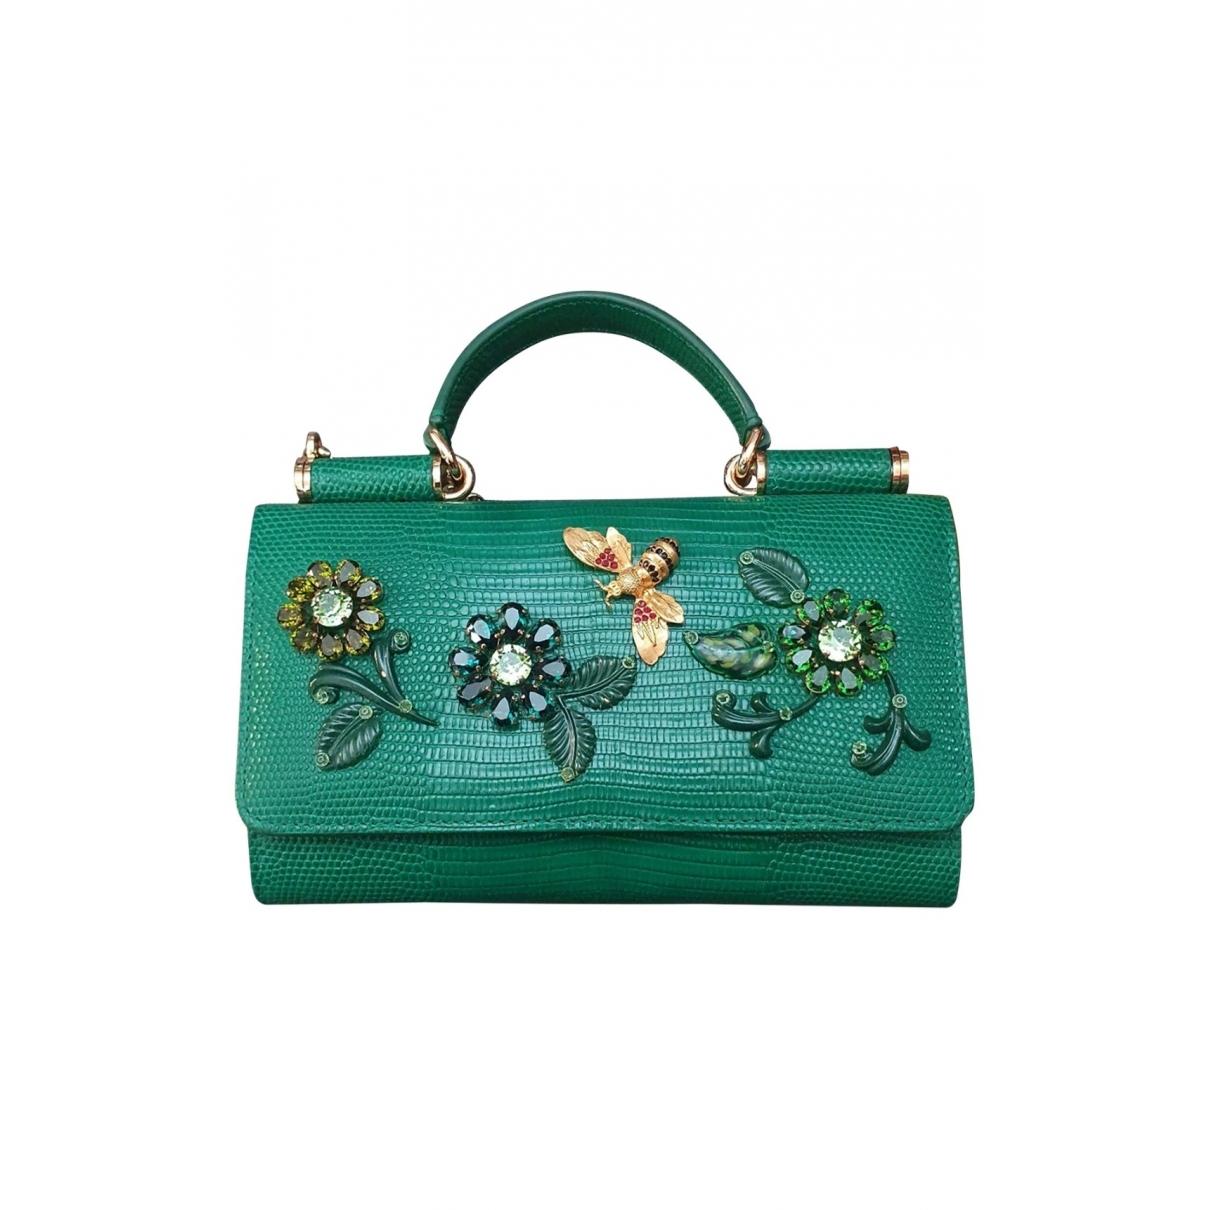 Dolce & Gabbana - Portefeuille   pour femme en lezard - vert